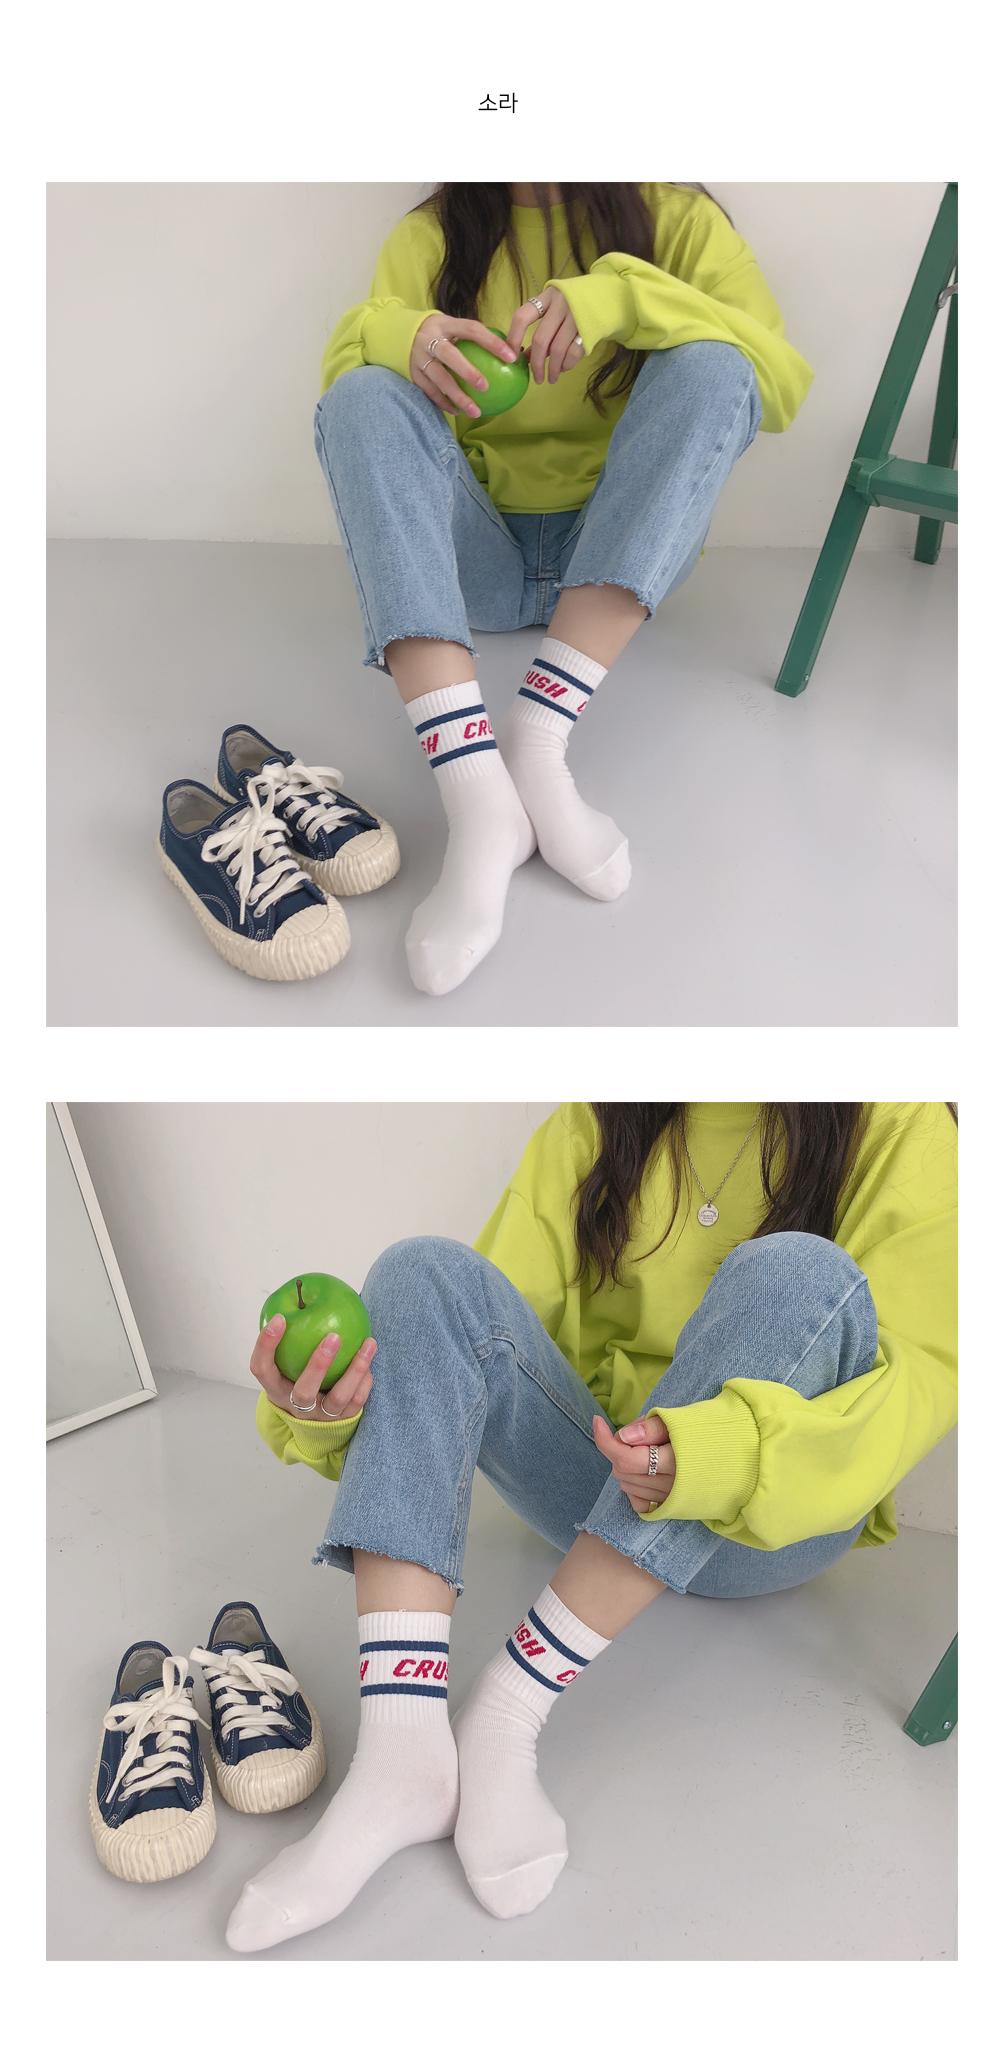 Fine line socks